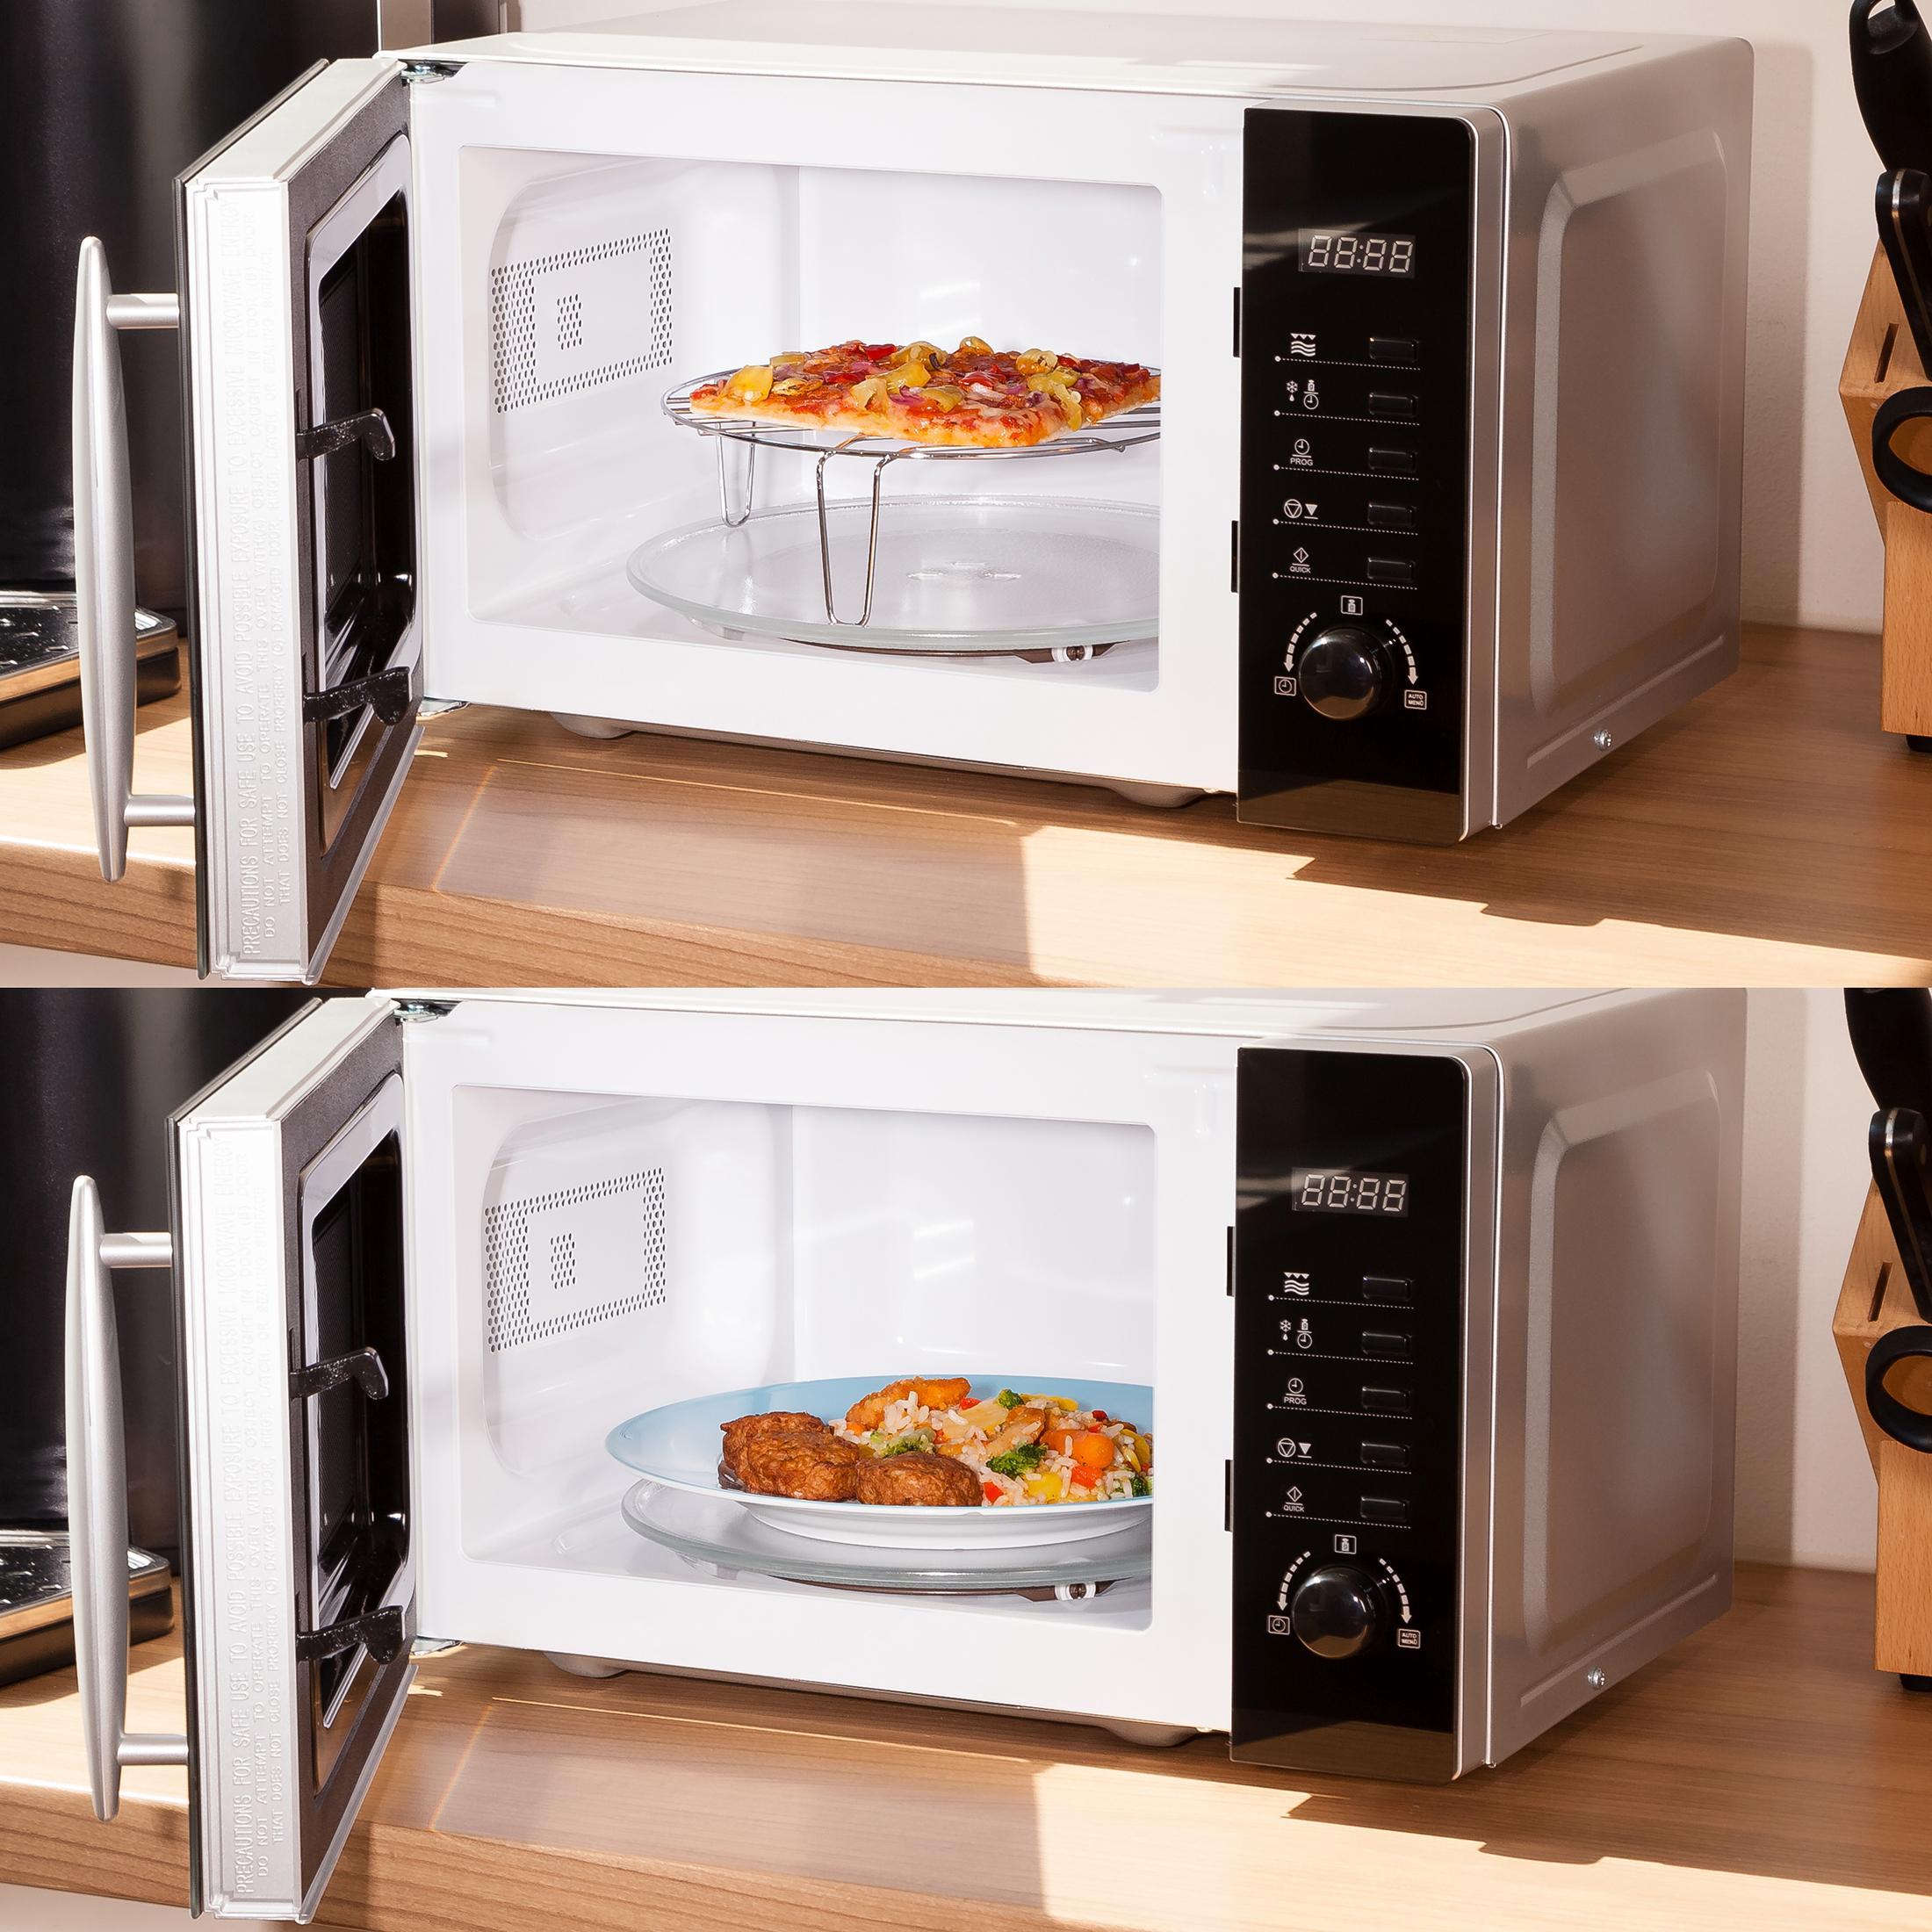 Ultratec cuisine 331400000117 mwg200 micro onde avec gril - Amazon four micro onde ...